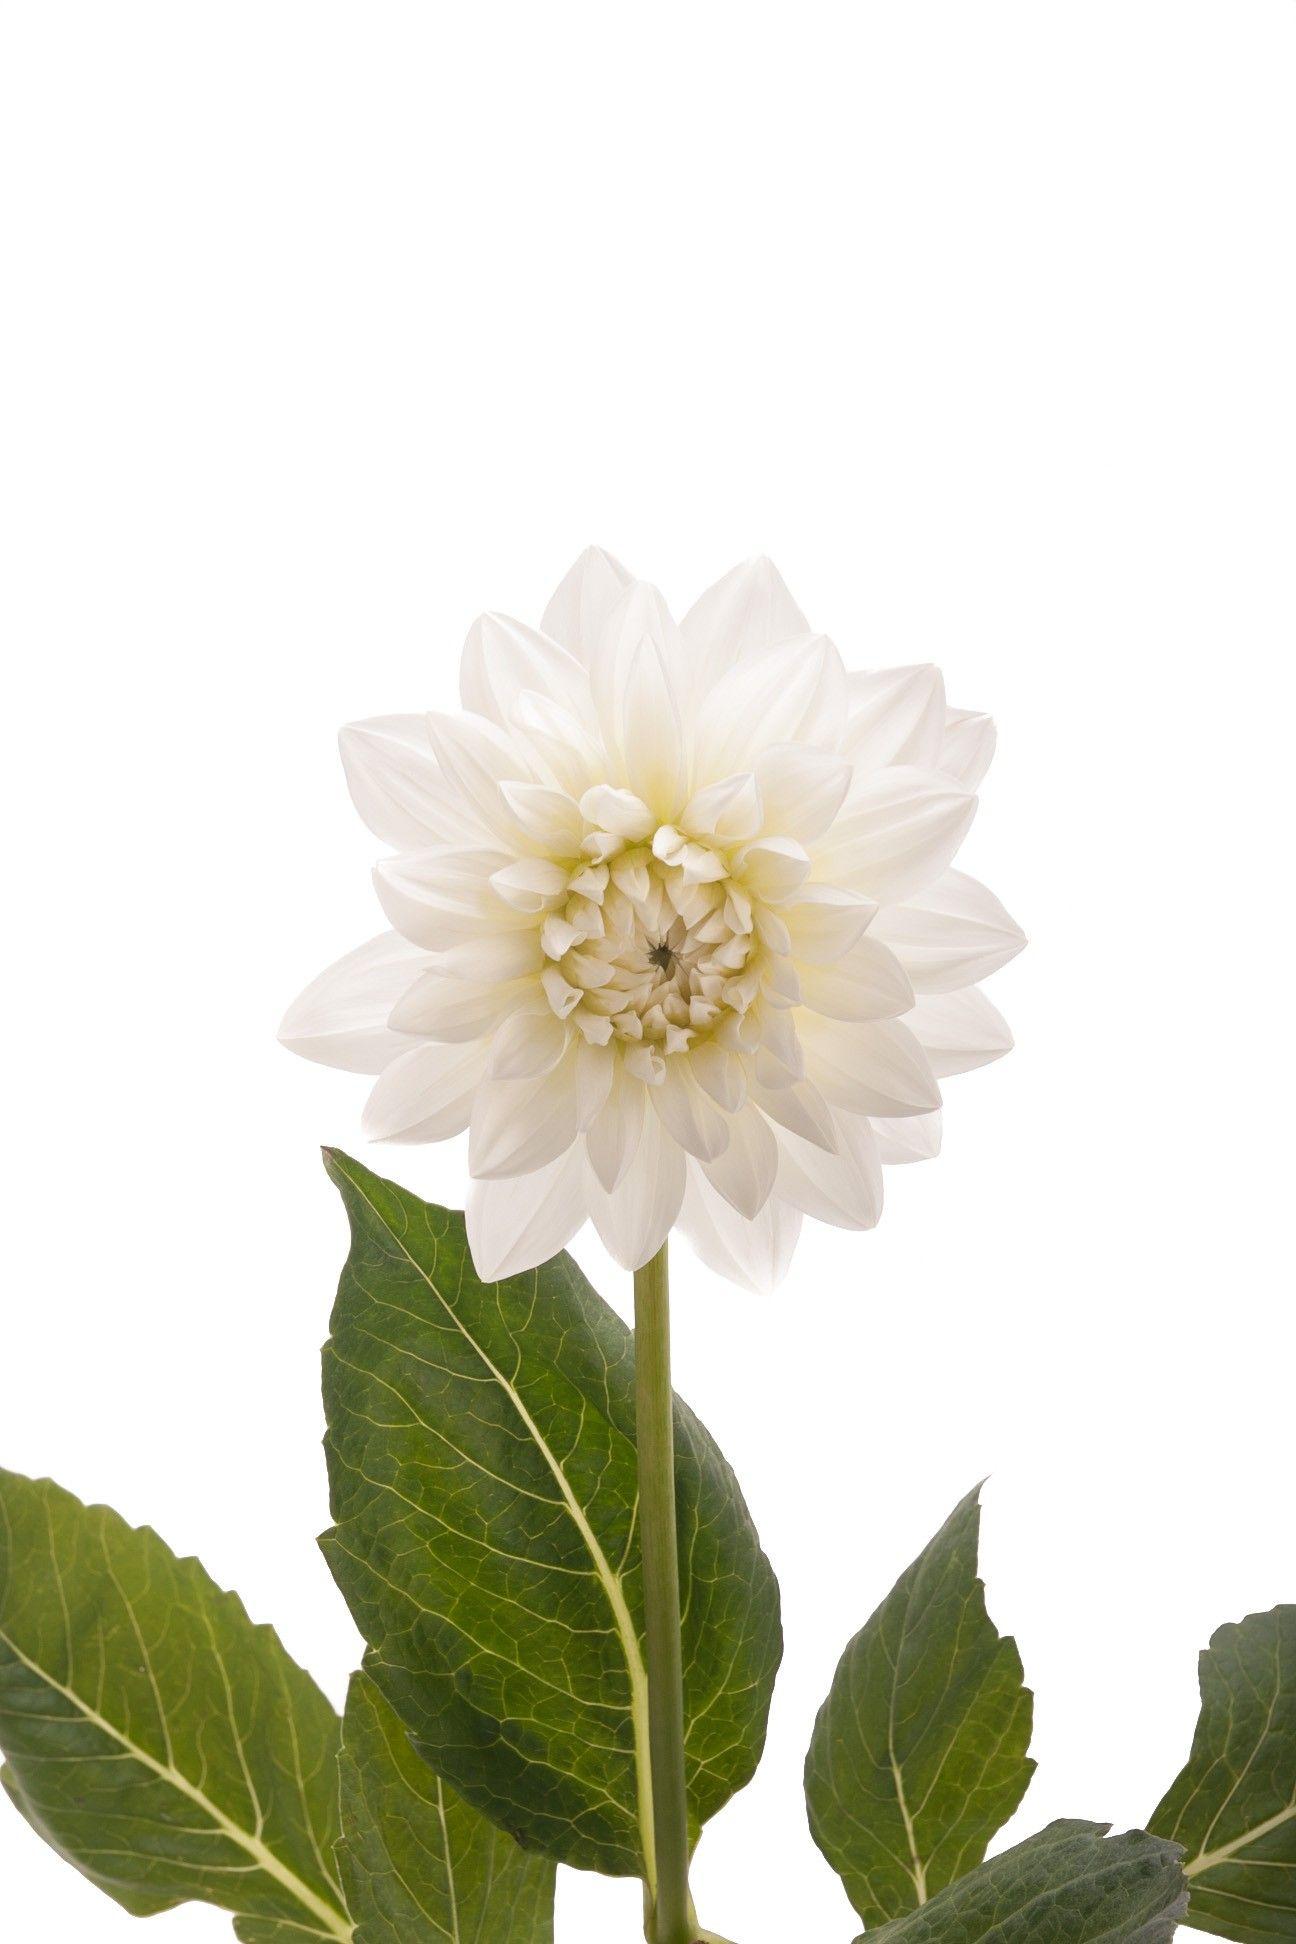 White Dahlia Flower Dahlias Types Of Flowers Flower Muse Types Of Flowers Dahlia Flower White Dahlias